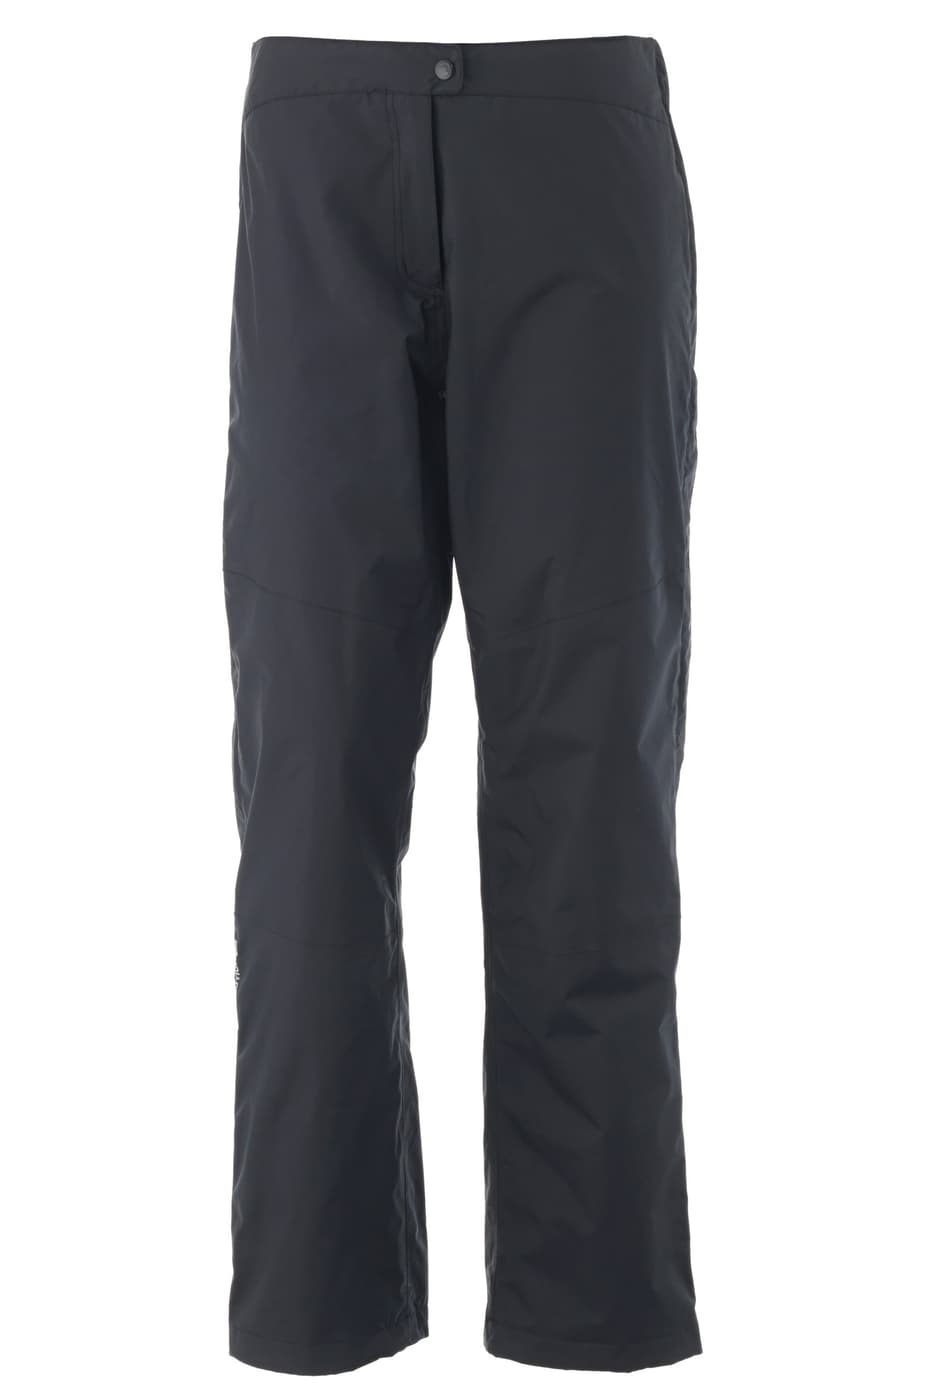 huge discount 35f61 b59b2 Trevolution Moni Pantaloni impermeabili da donna